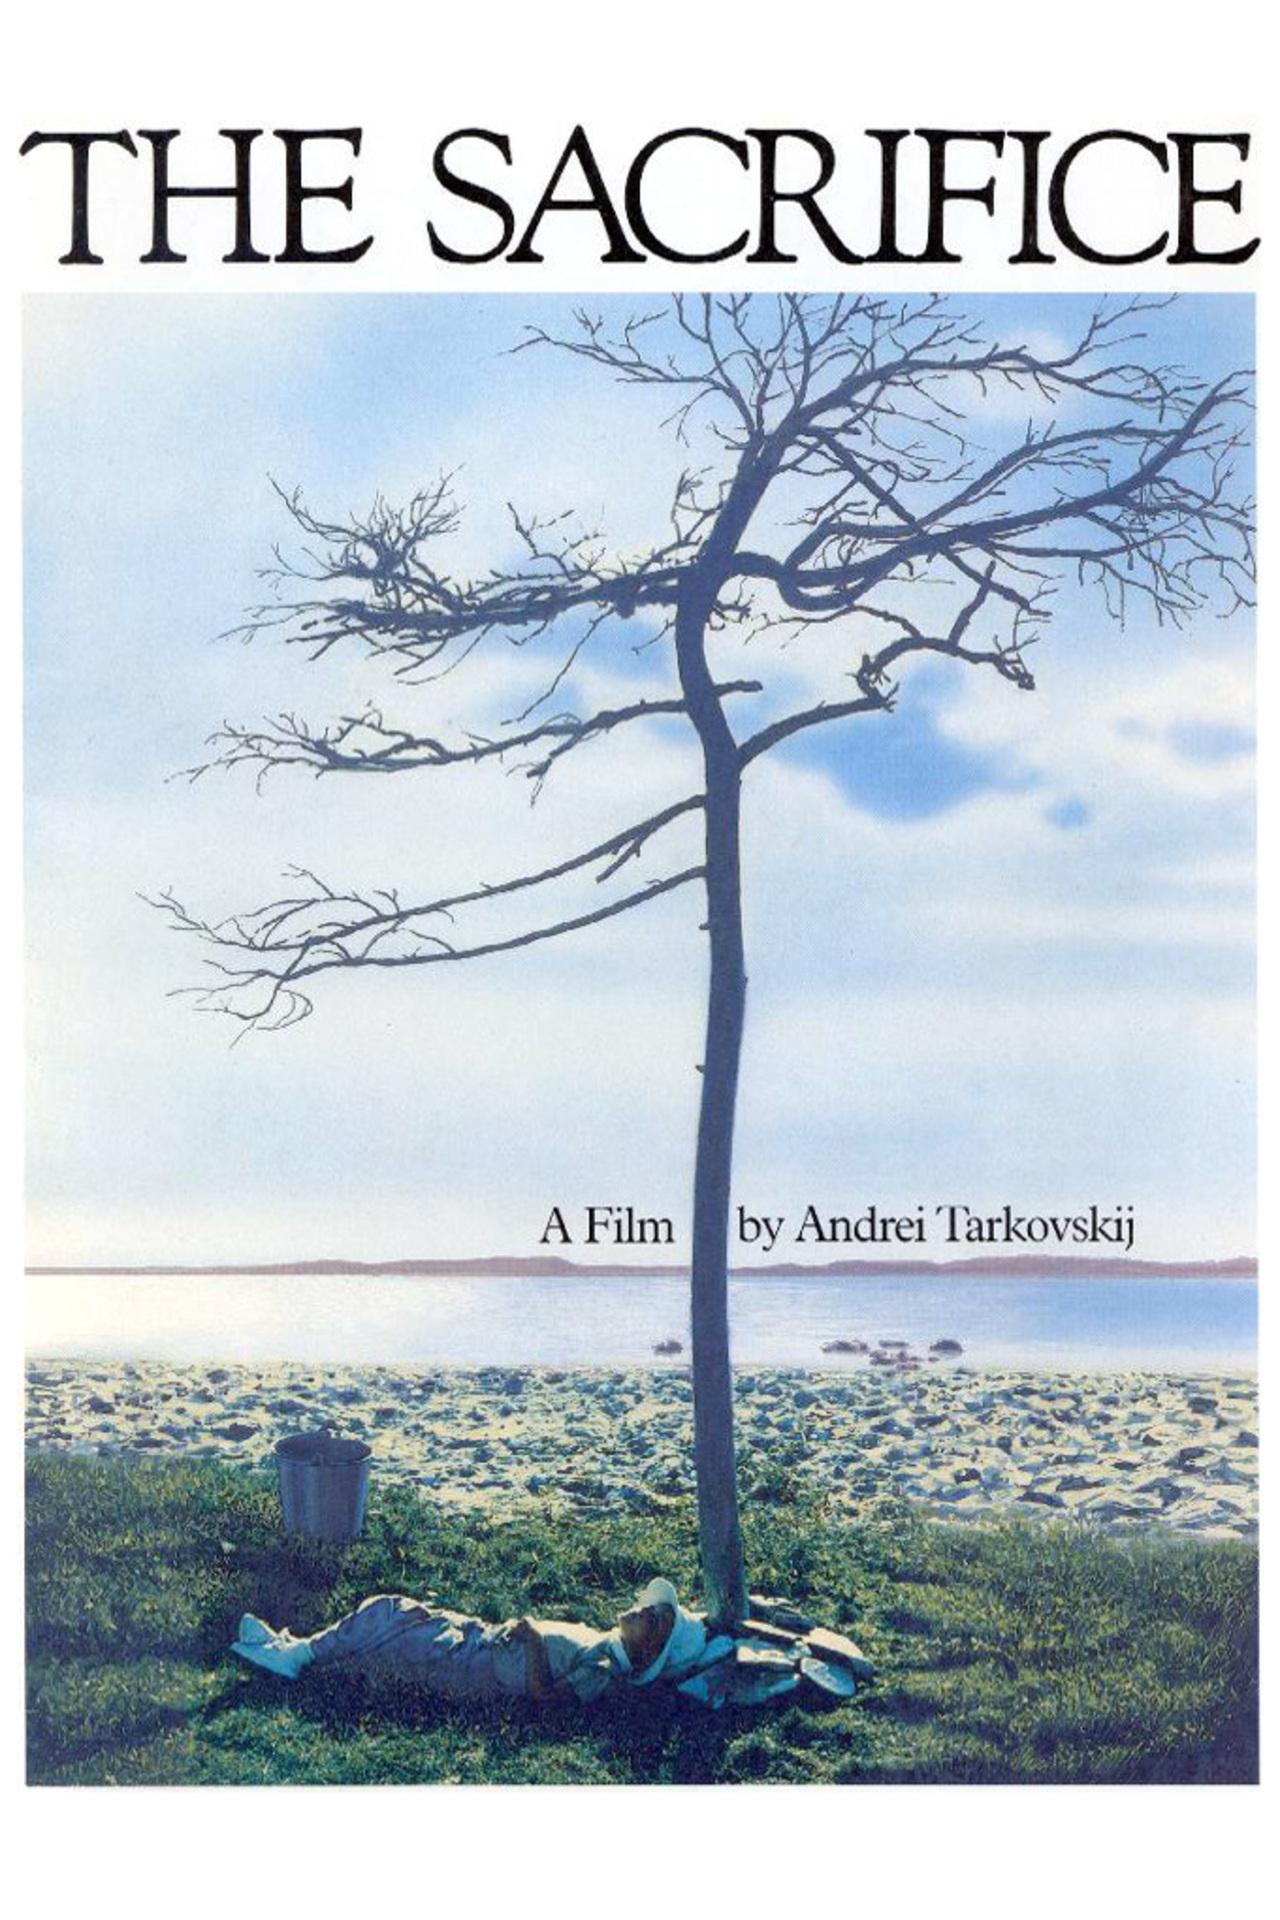 Le Sacrifice d'Andreï Tarkovski